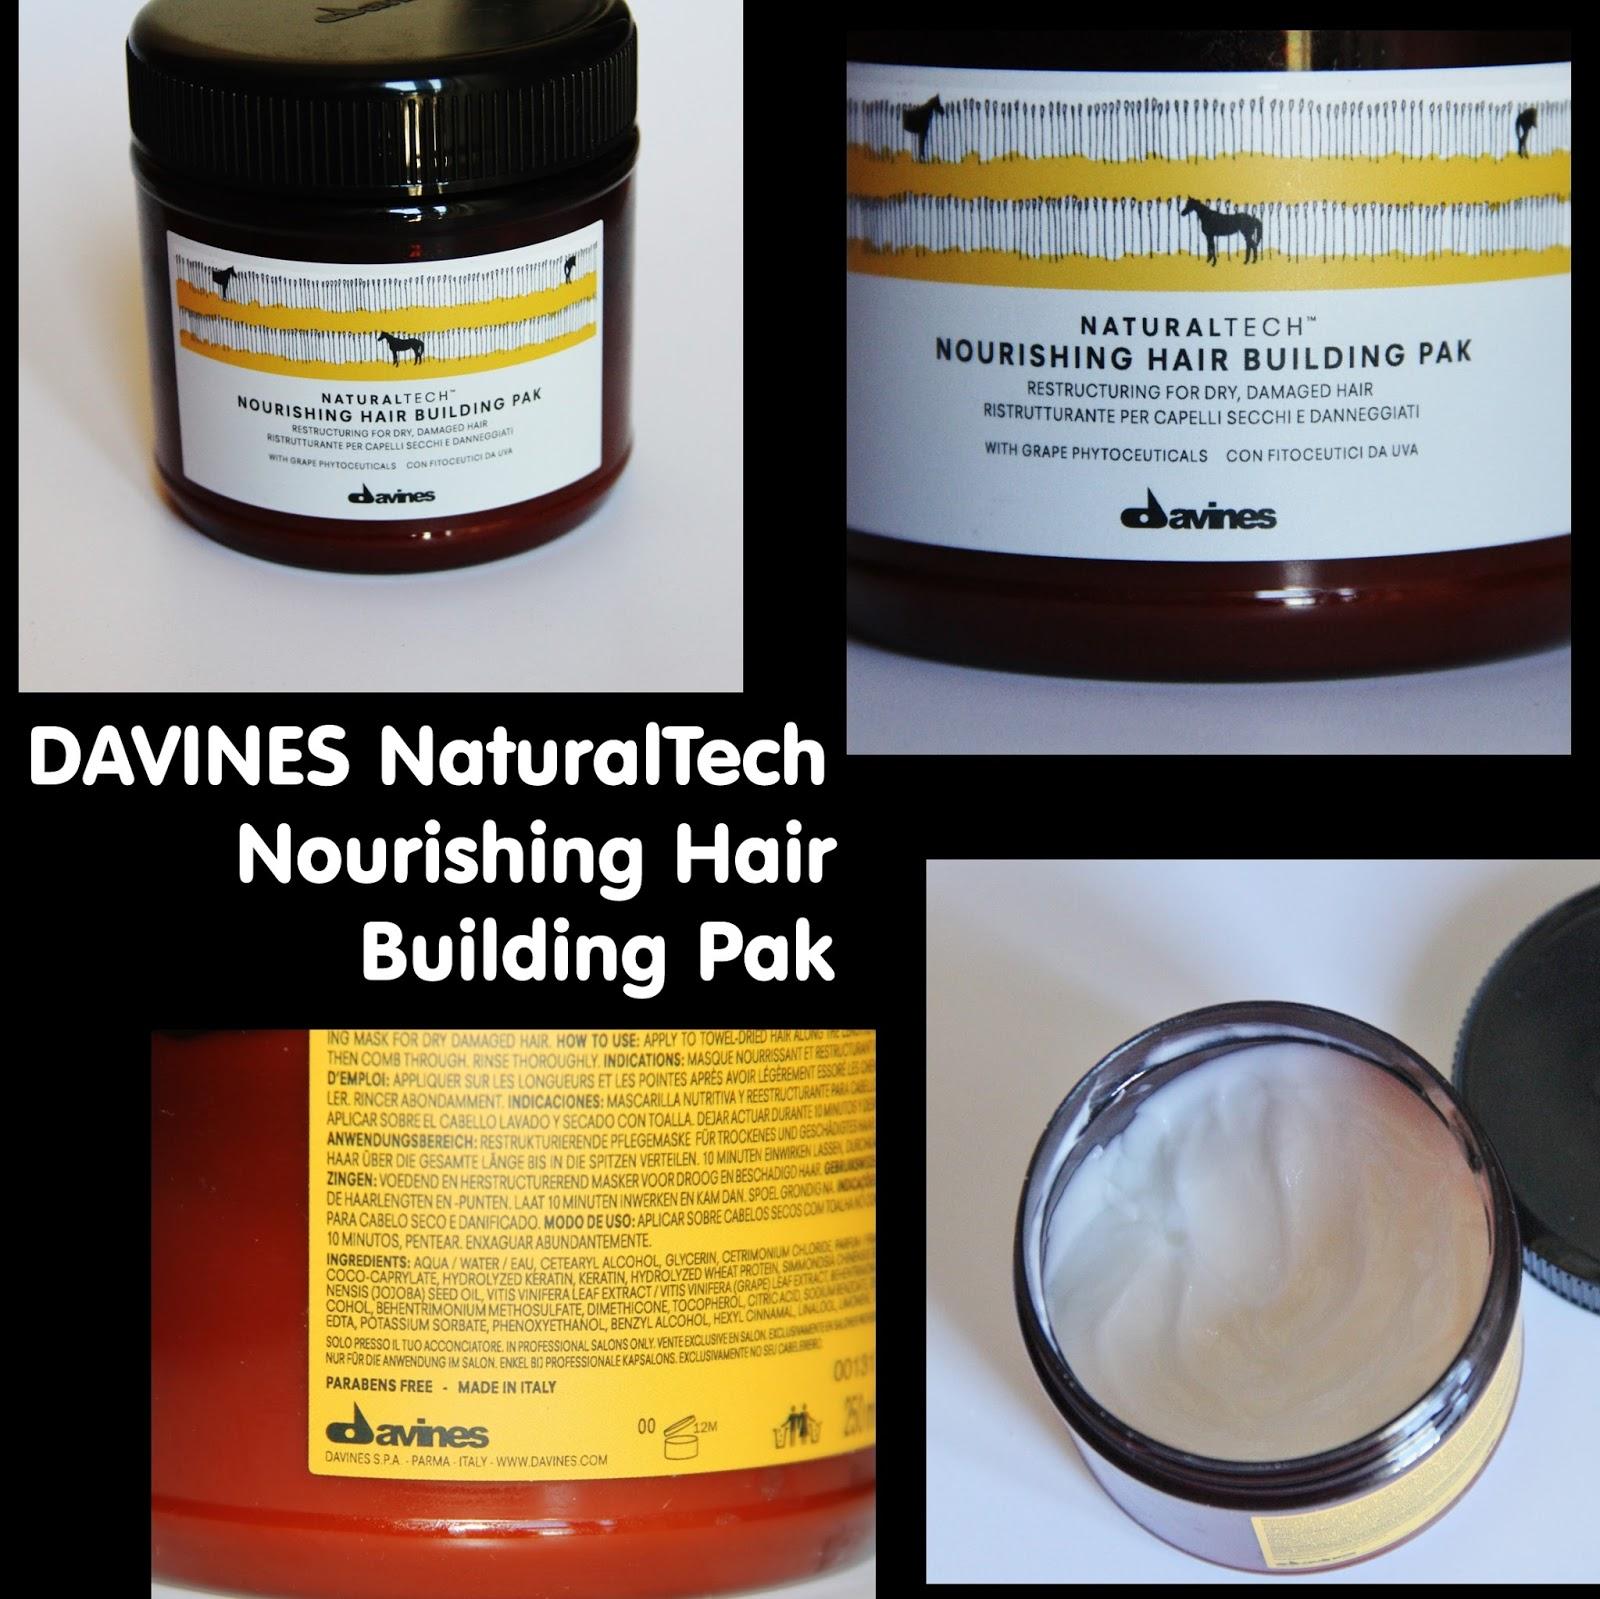 Michelaismyname Davines Naturaltech Nourishing Hair Building Pak Review